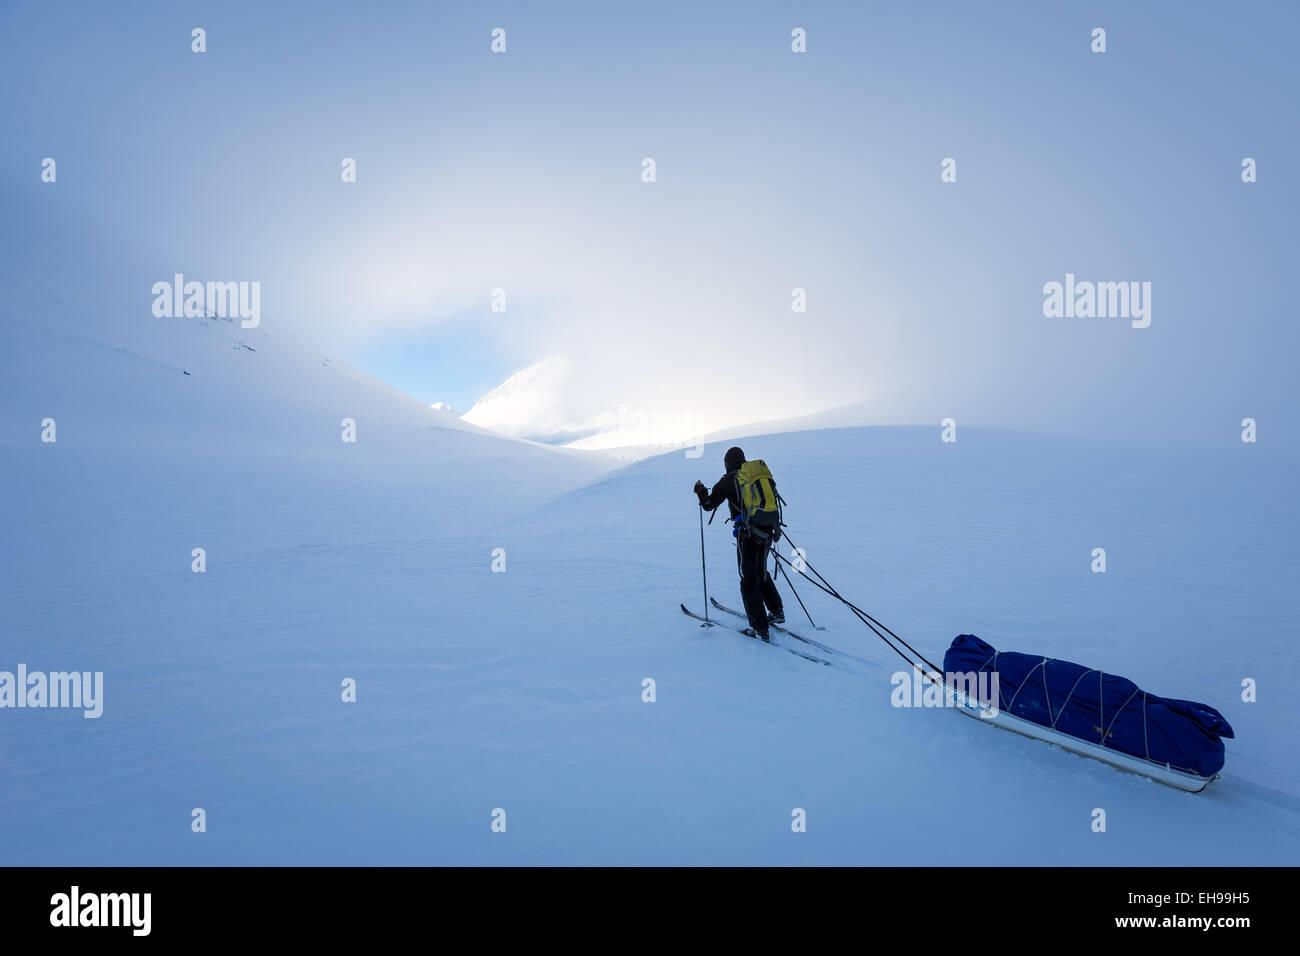 Skifahren, Wandern in der Nähe von Nallostugan, Kiruna, Schweden, Europa, EU Stockfoto